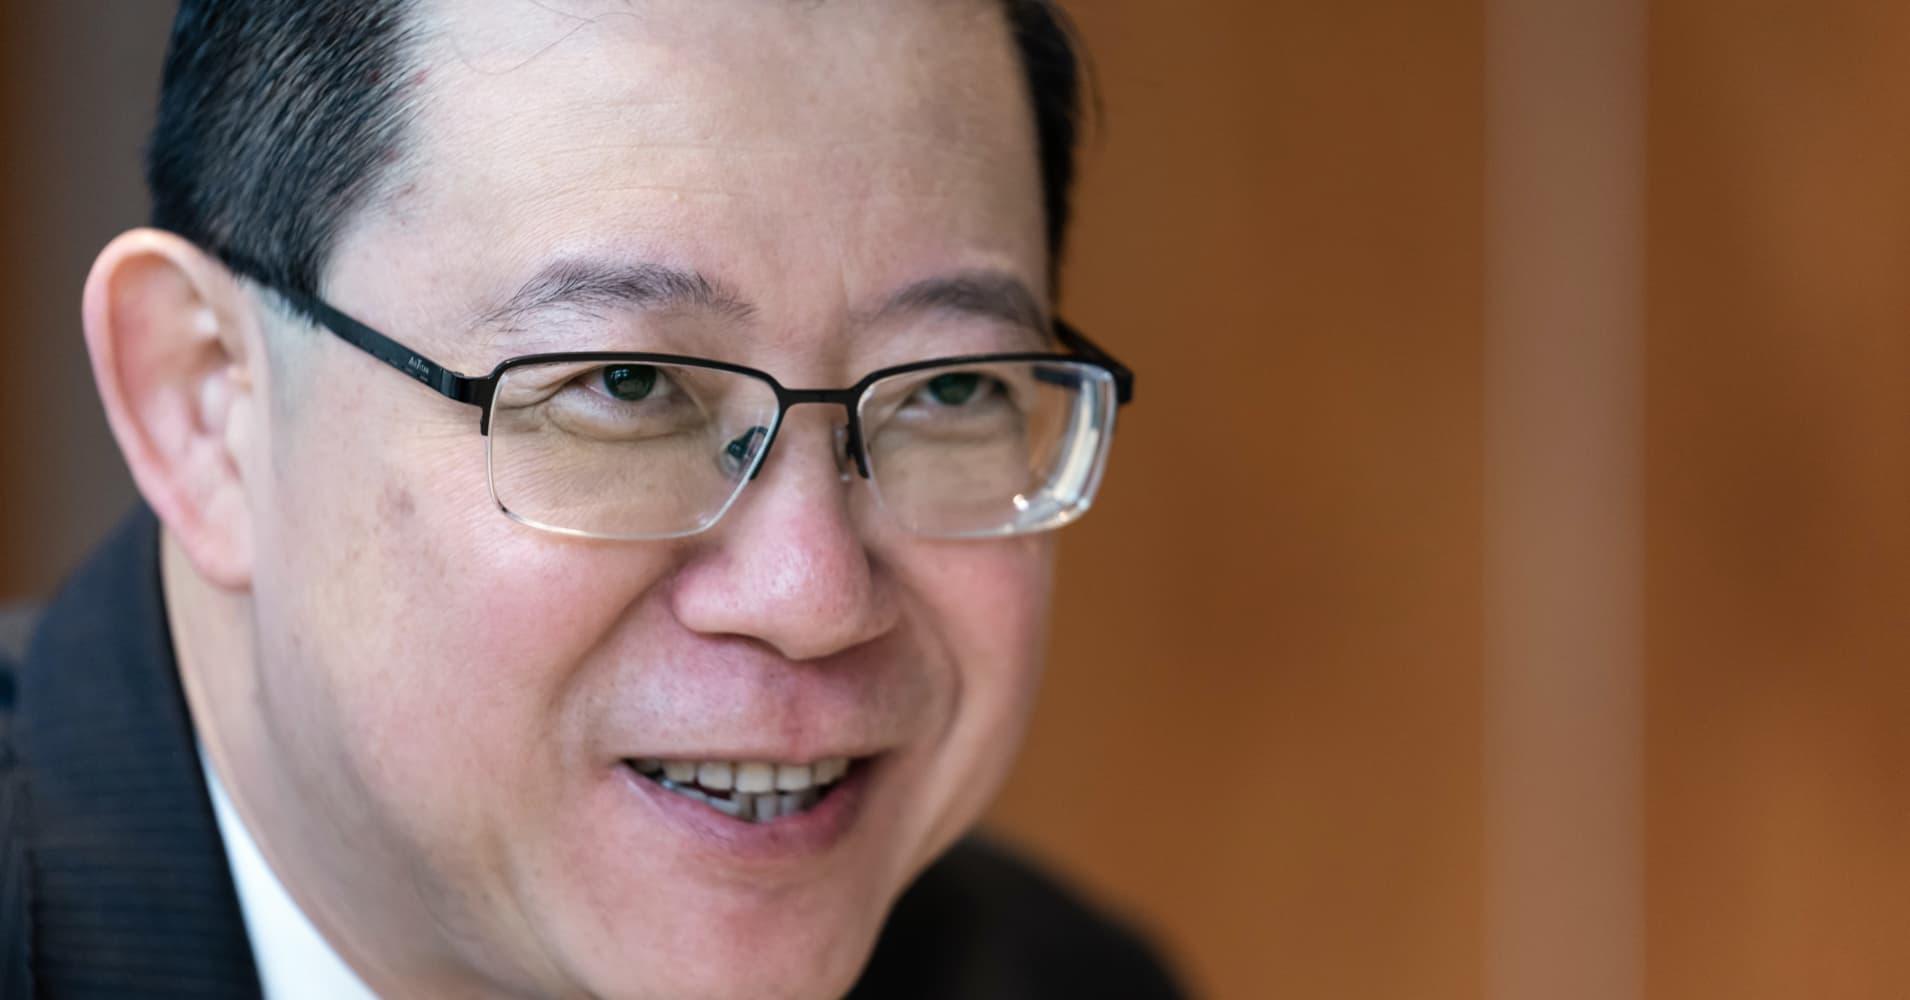 $7.5 billion from Goldman Sachs over 1MDB is 'reasonable': Malaysia